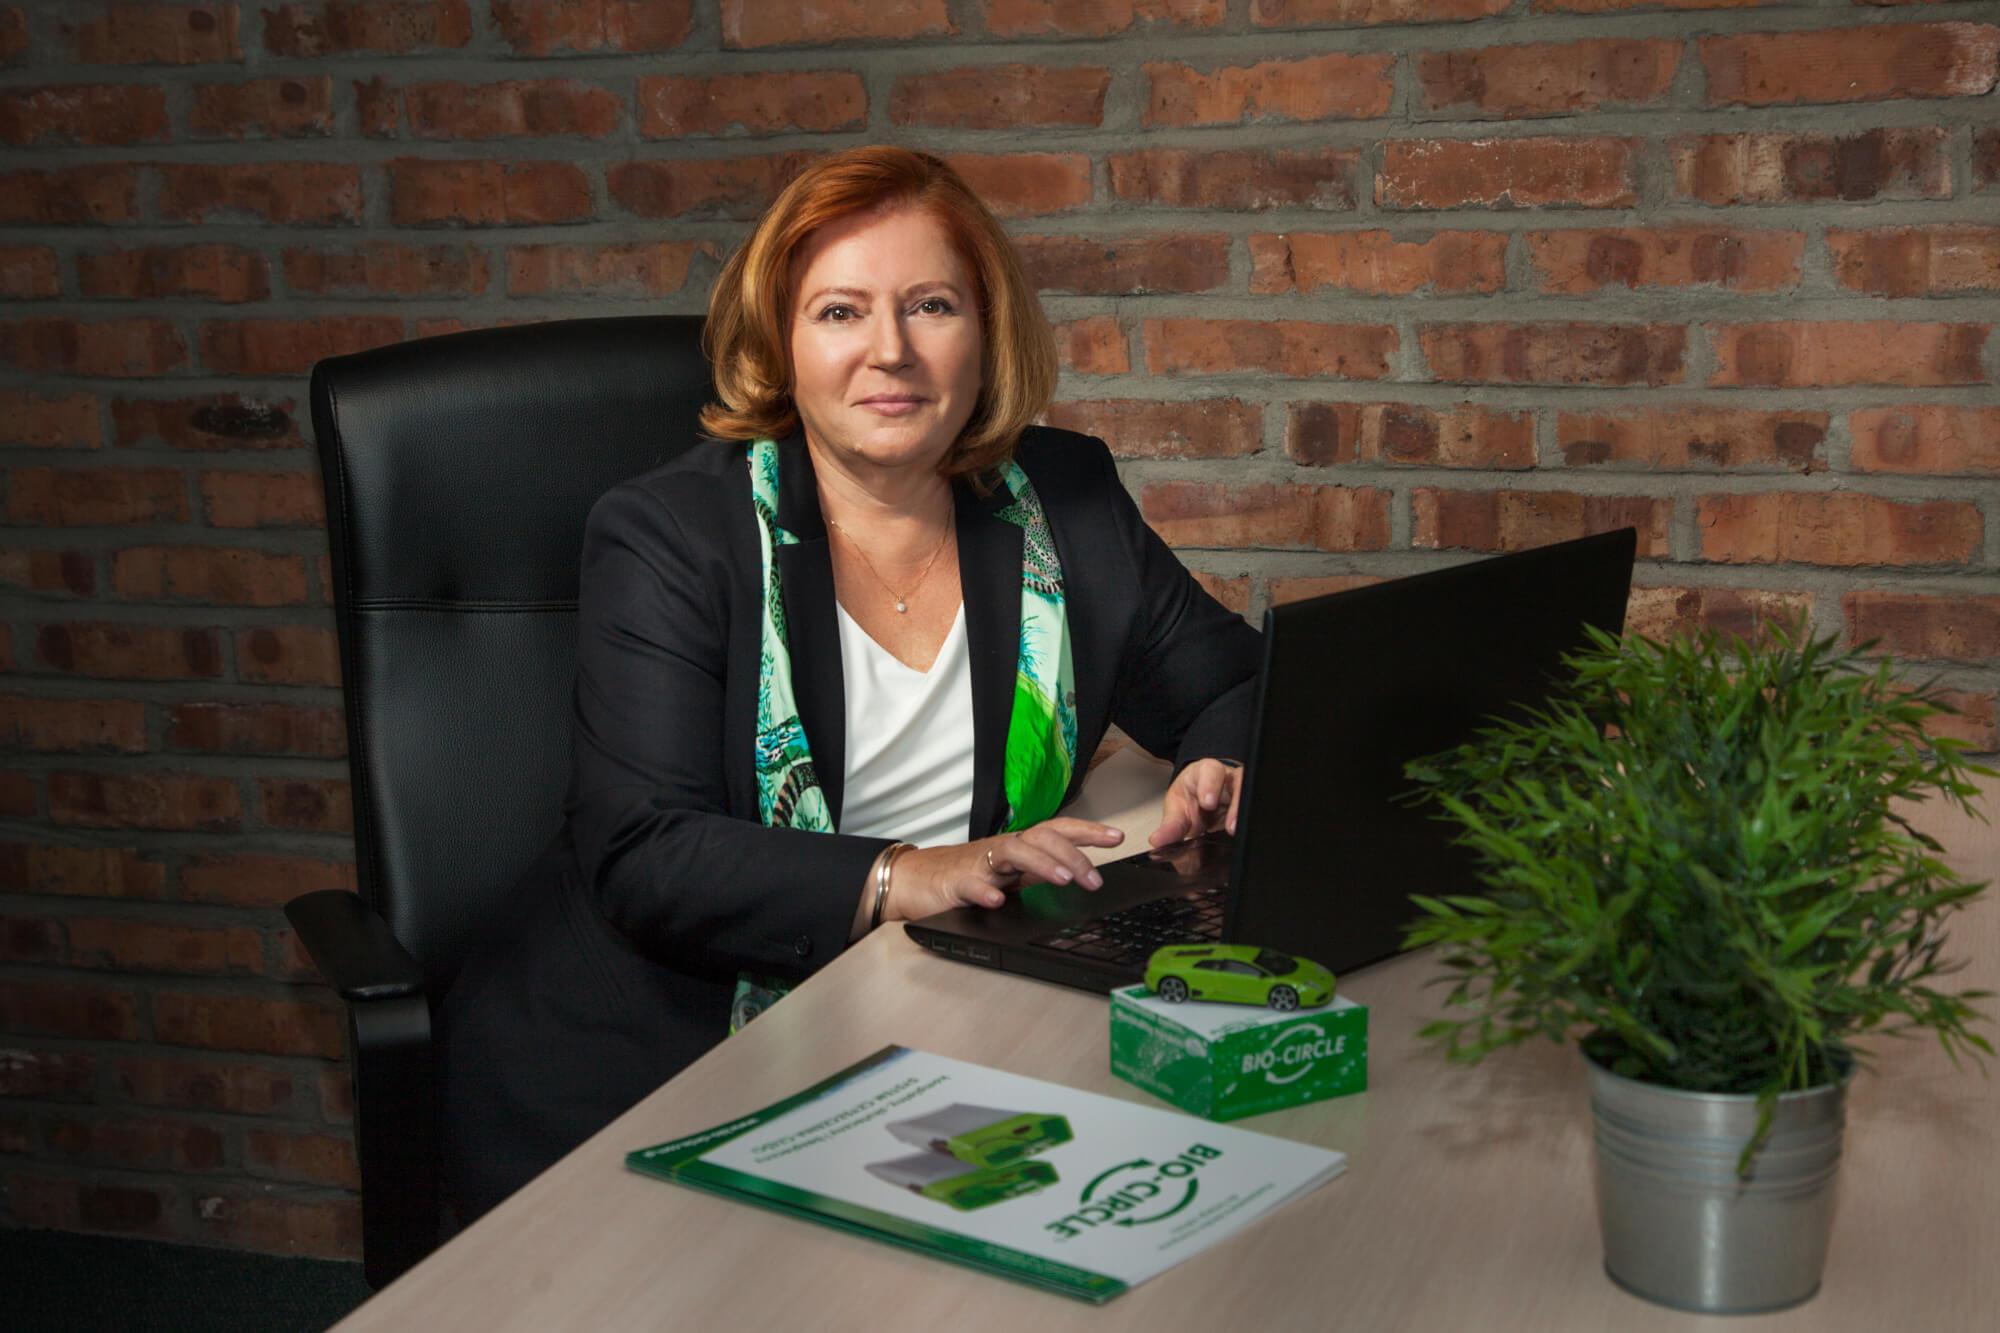 Renata-Nowacka-Hopaluk-small